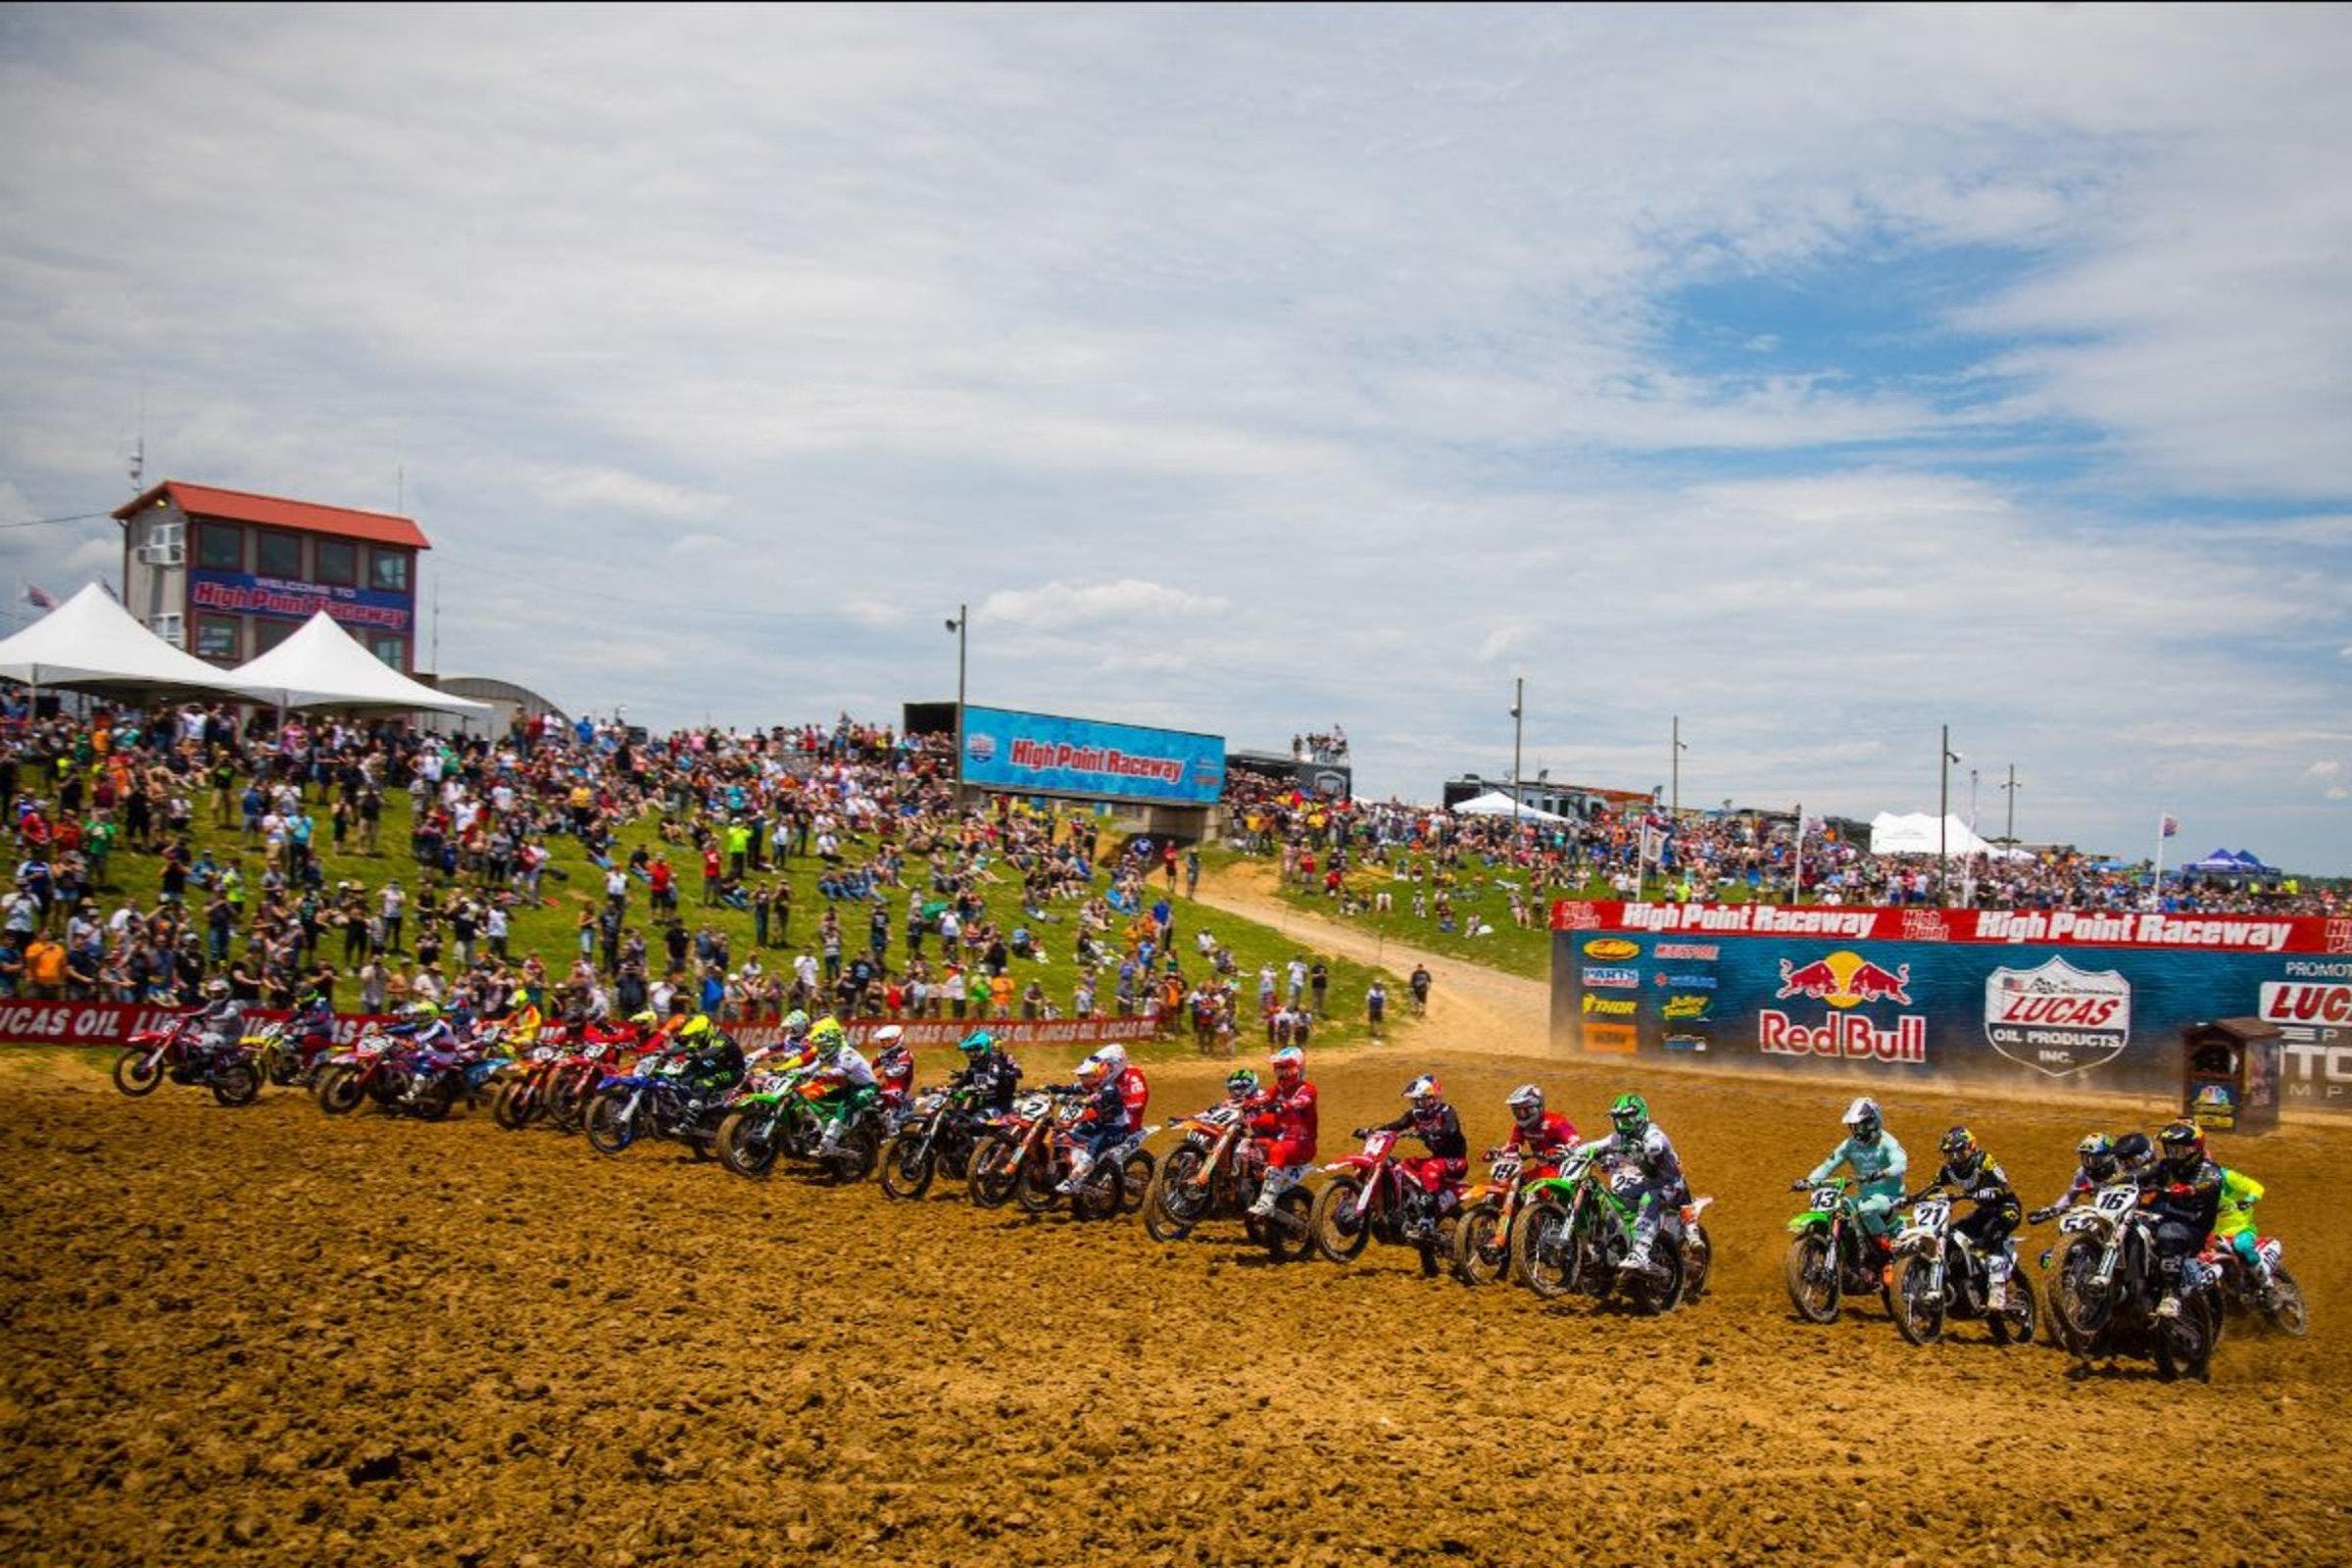 2020 lucas oil pro motocross championship tickets now on sale - motocross